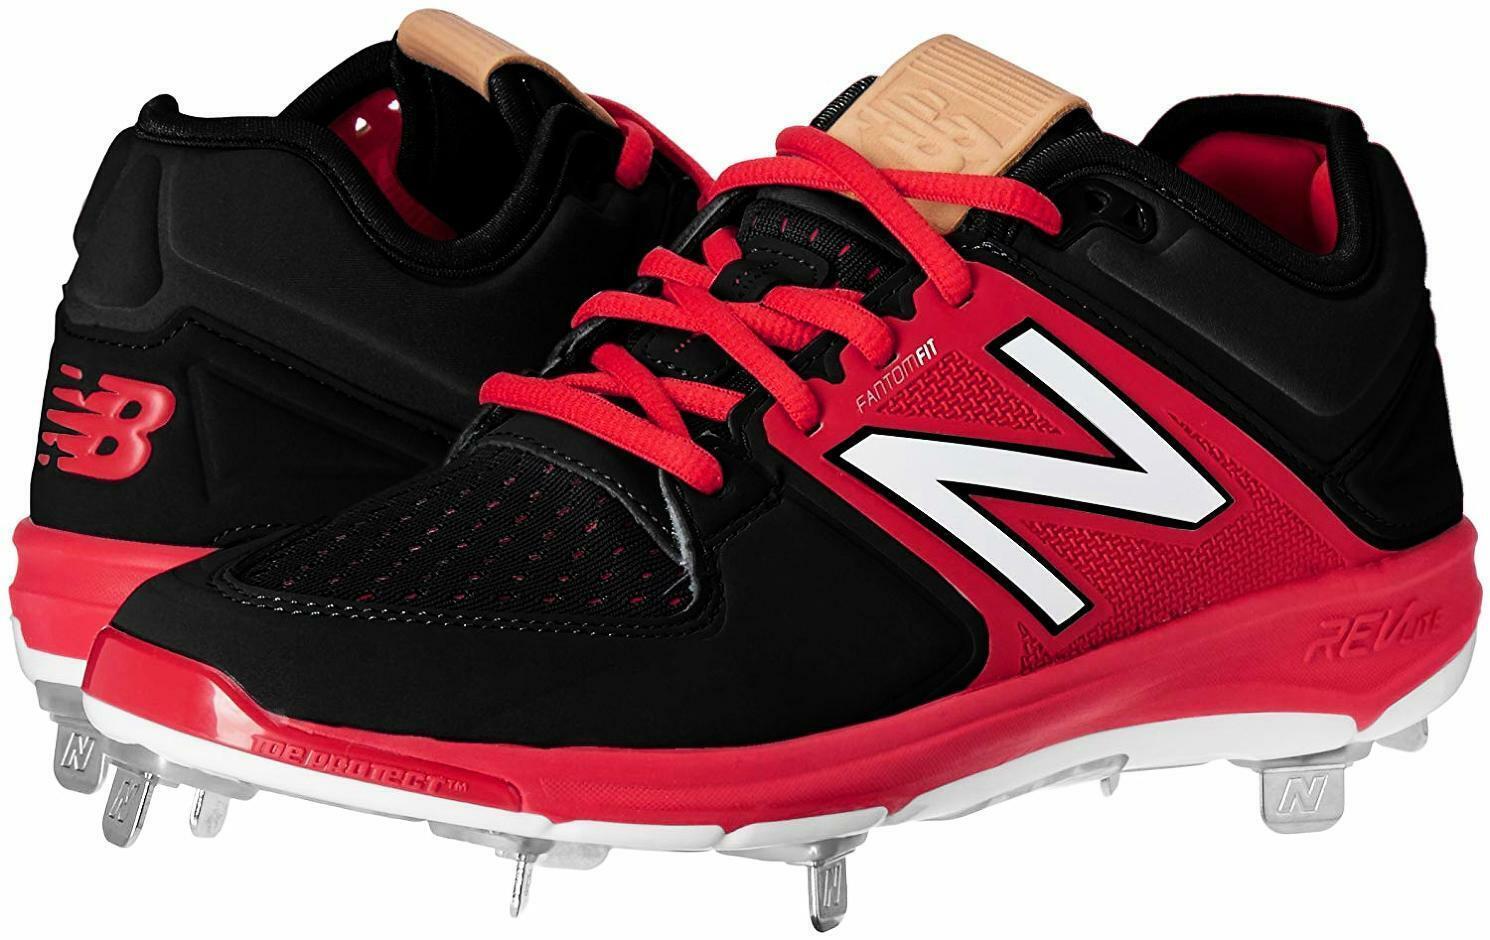 New Balance Uomo L3000v3 Metal Baseball scarpe - - - Choose SZ Coloree 8ebf73